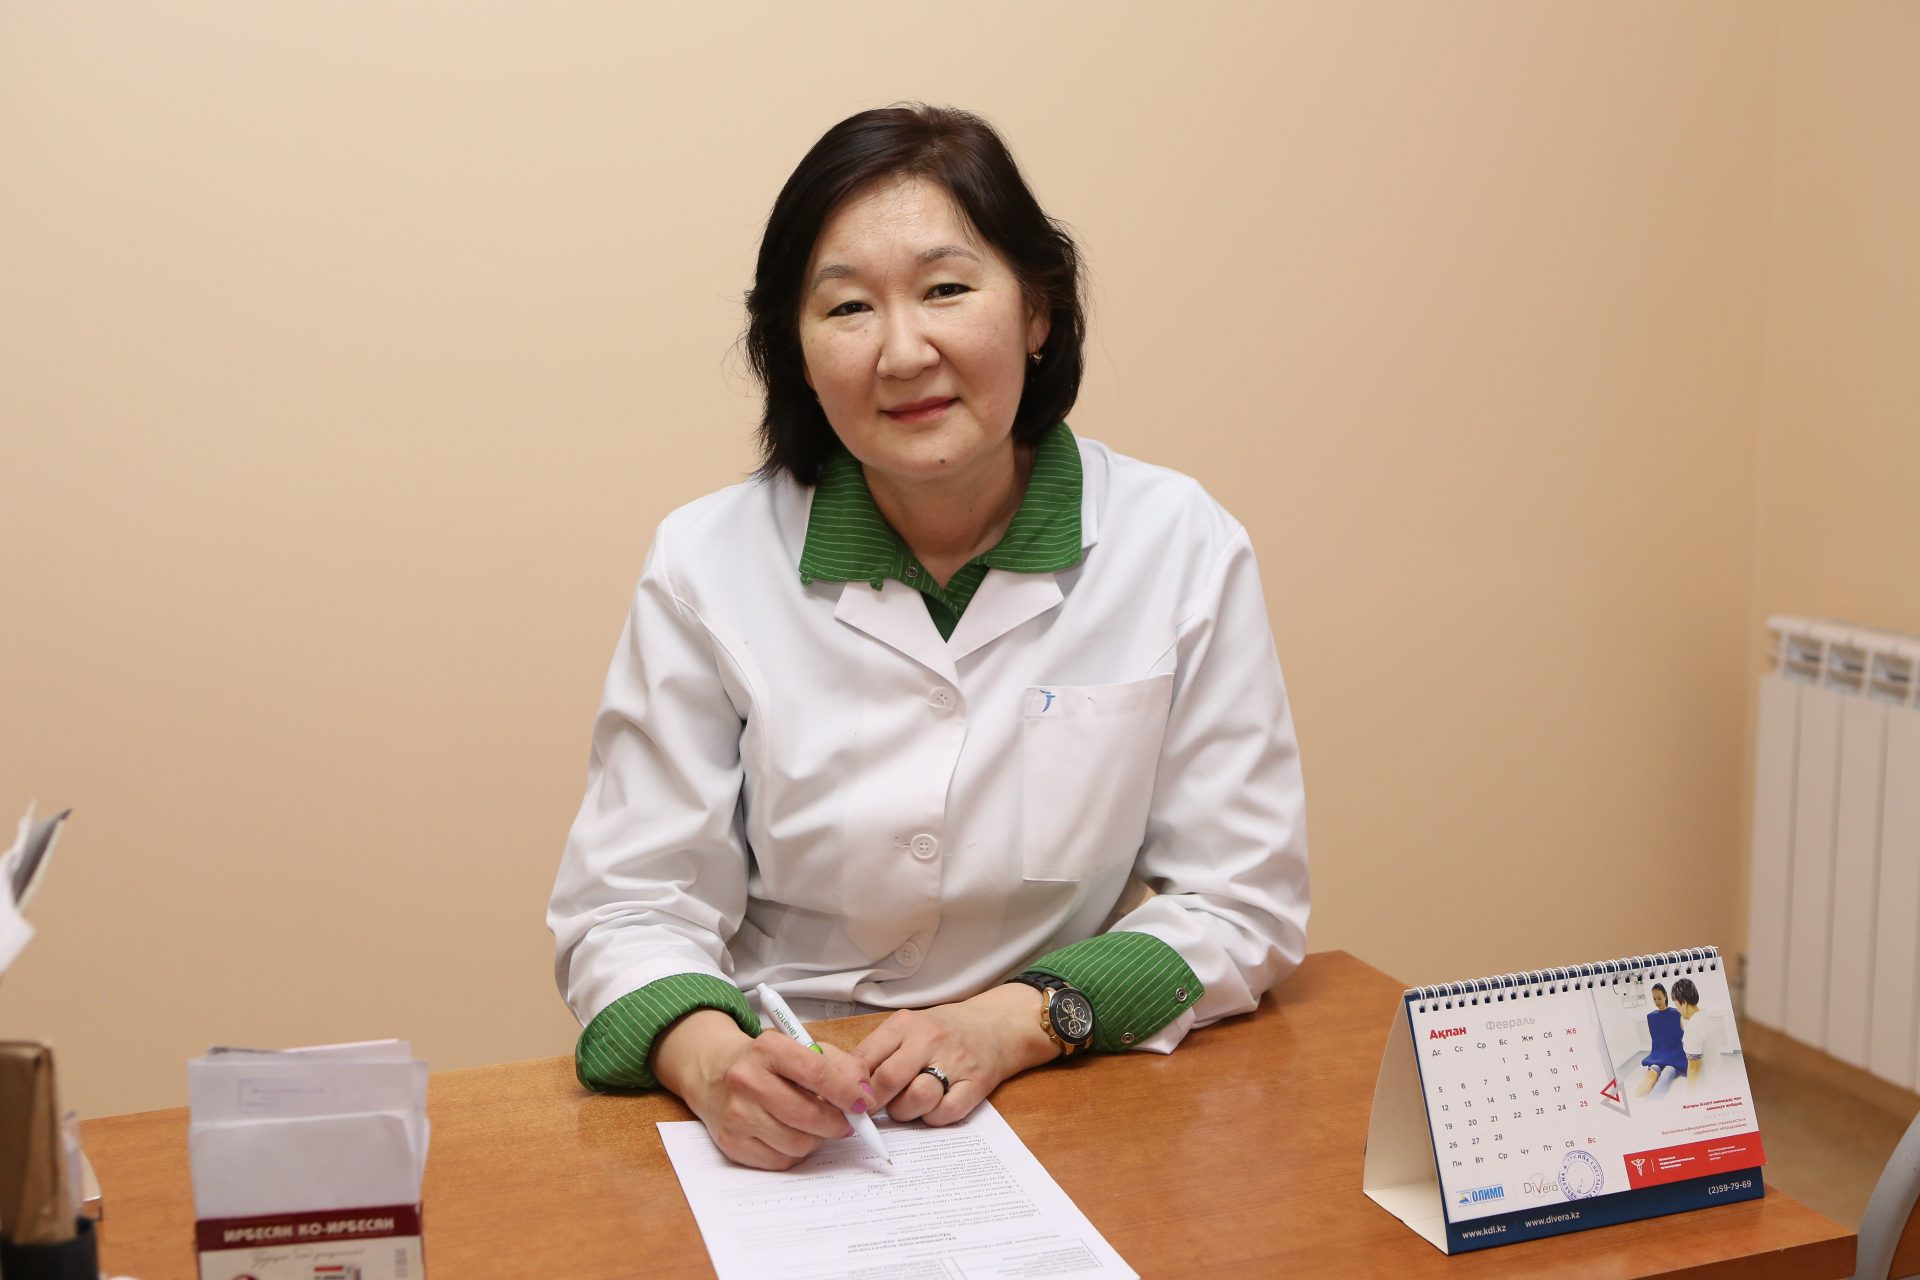 Д-р Баспаева Мира Булатовна - Маммолог - Актобе